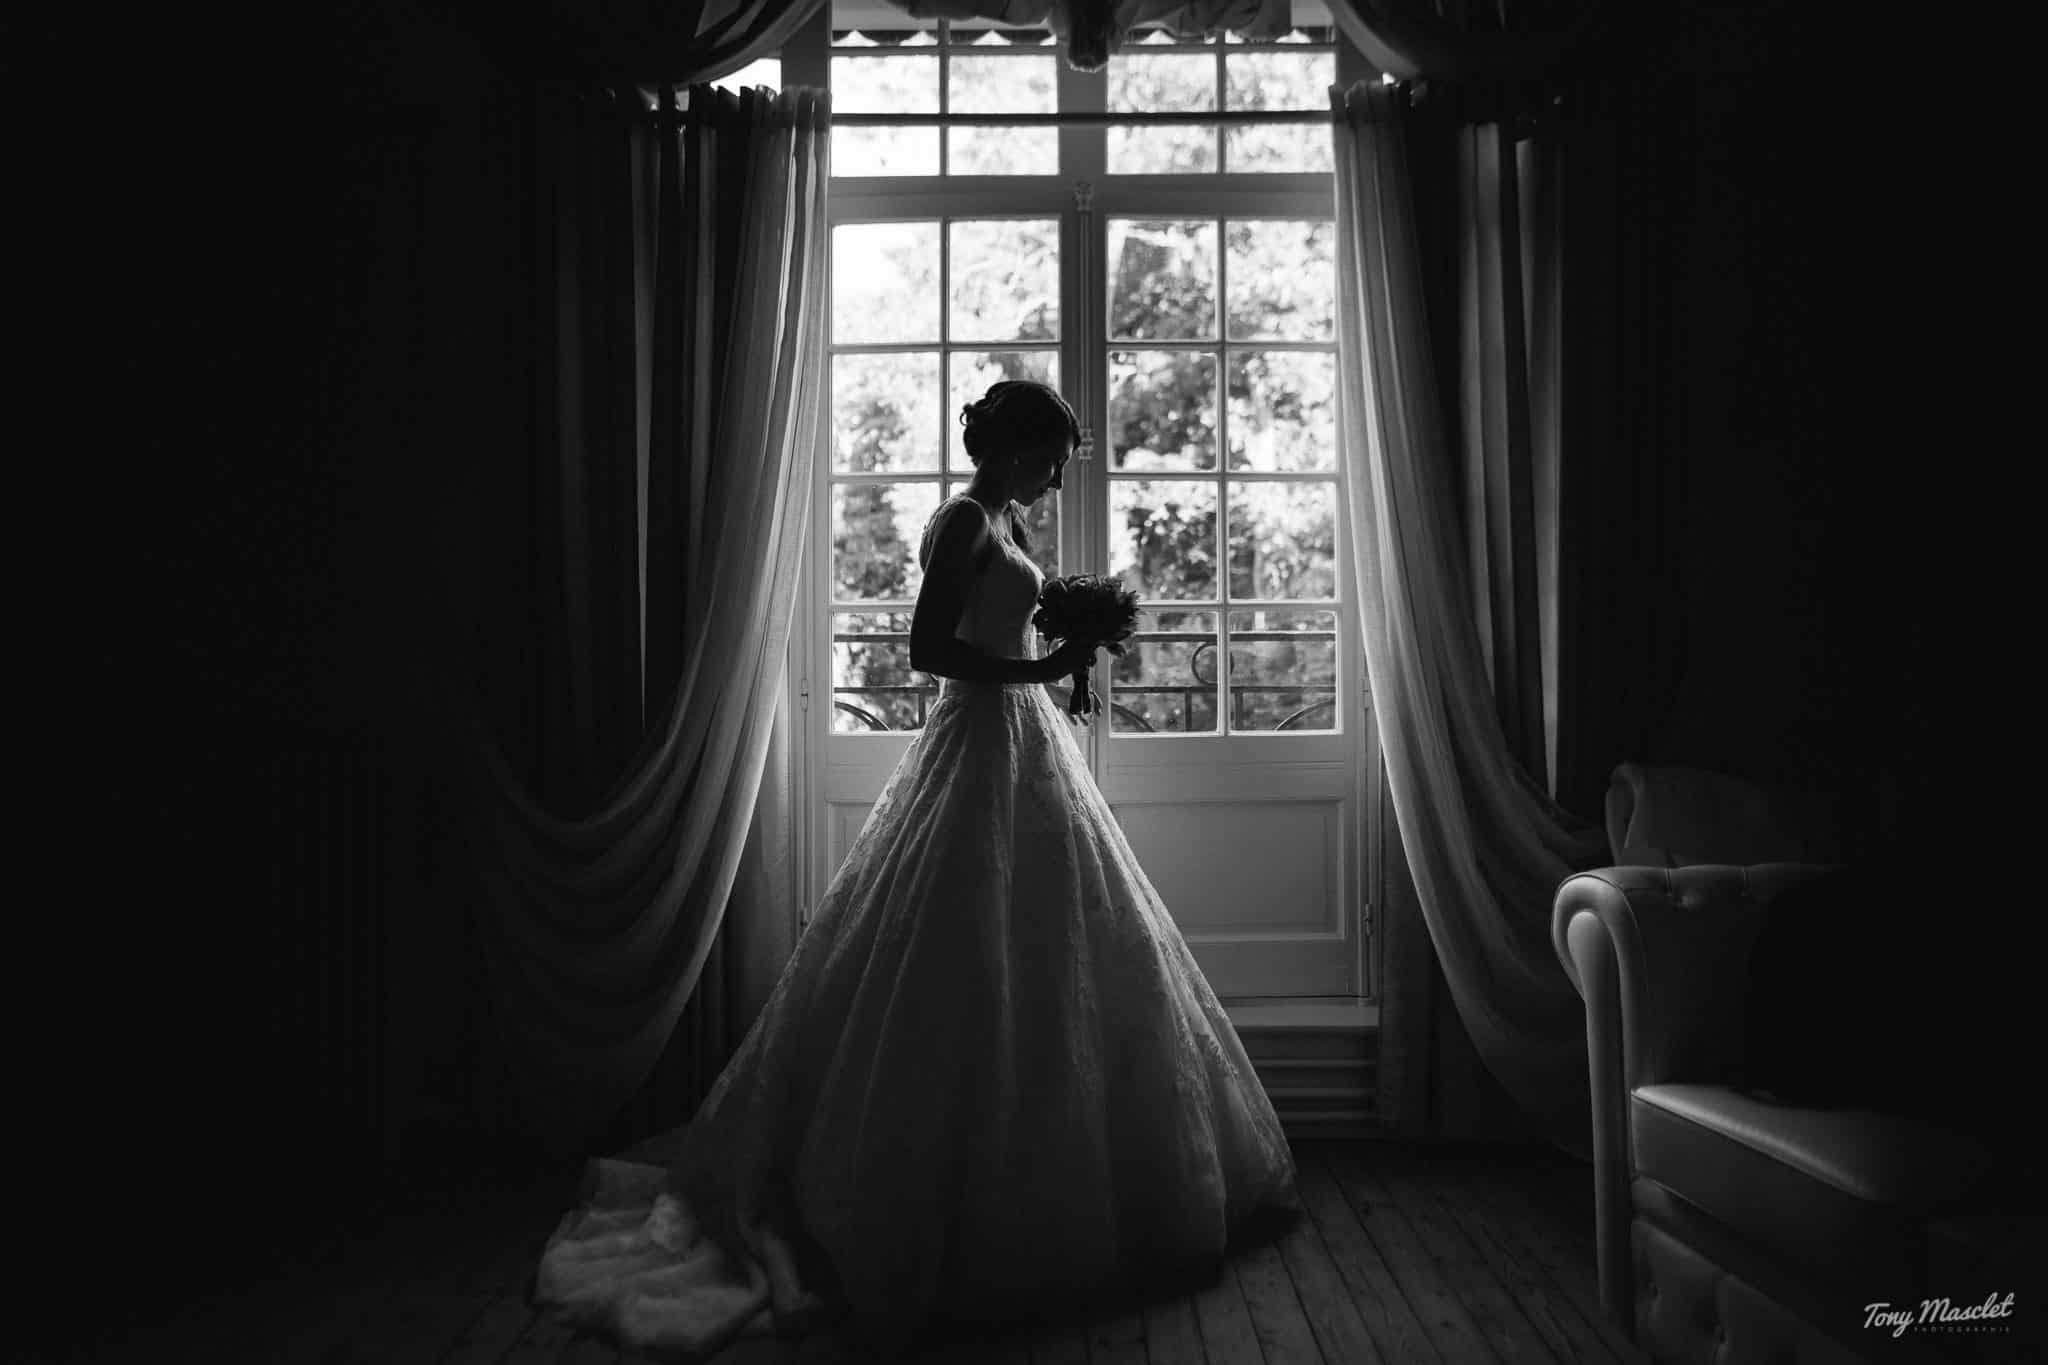 ManoirLeLouisXXI photographe mariage lille nord tourcoing